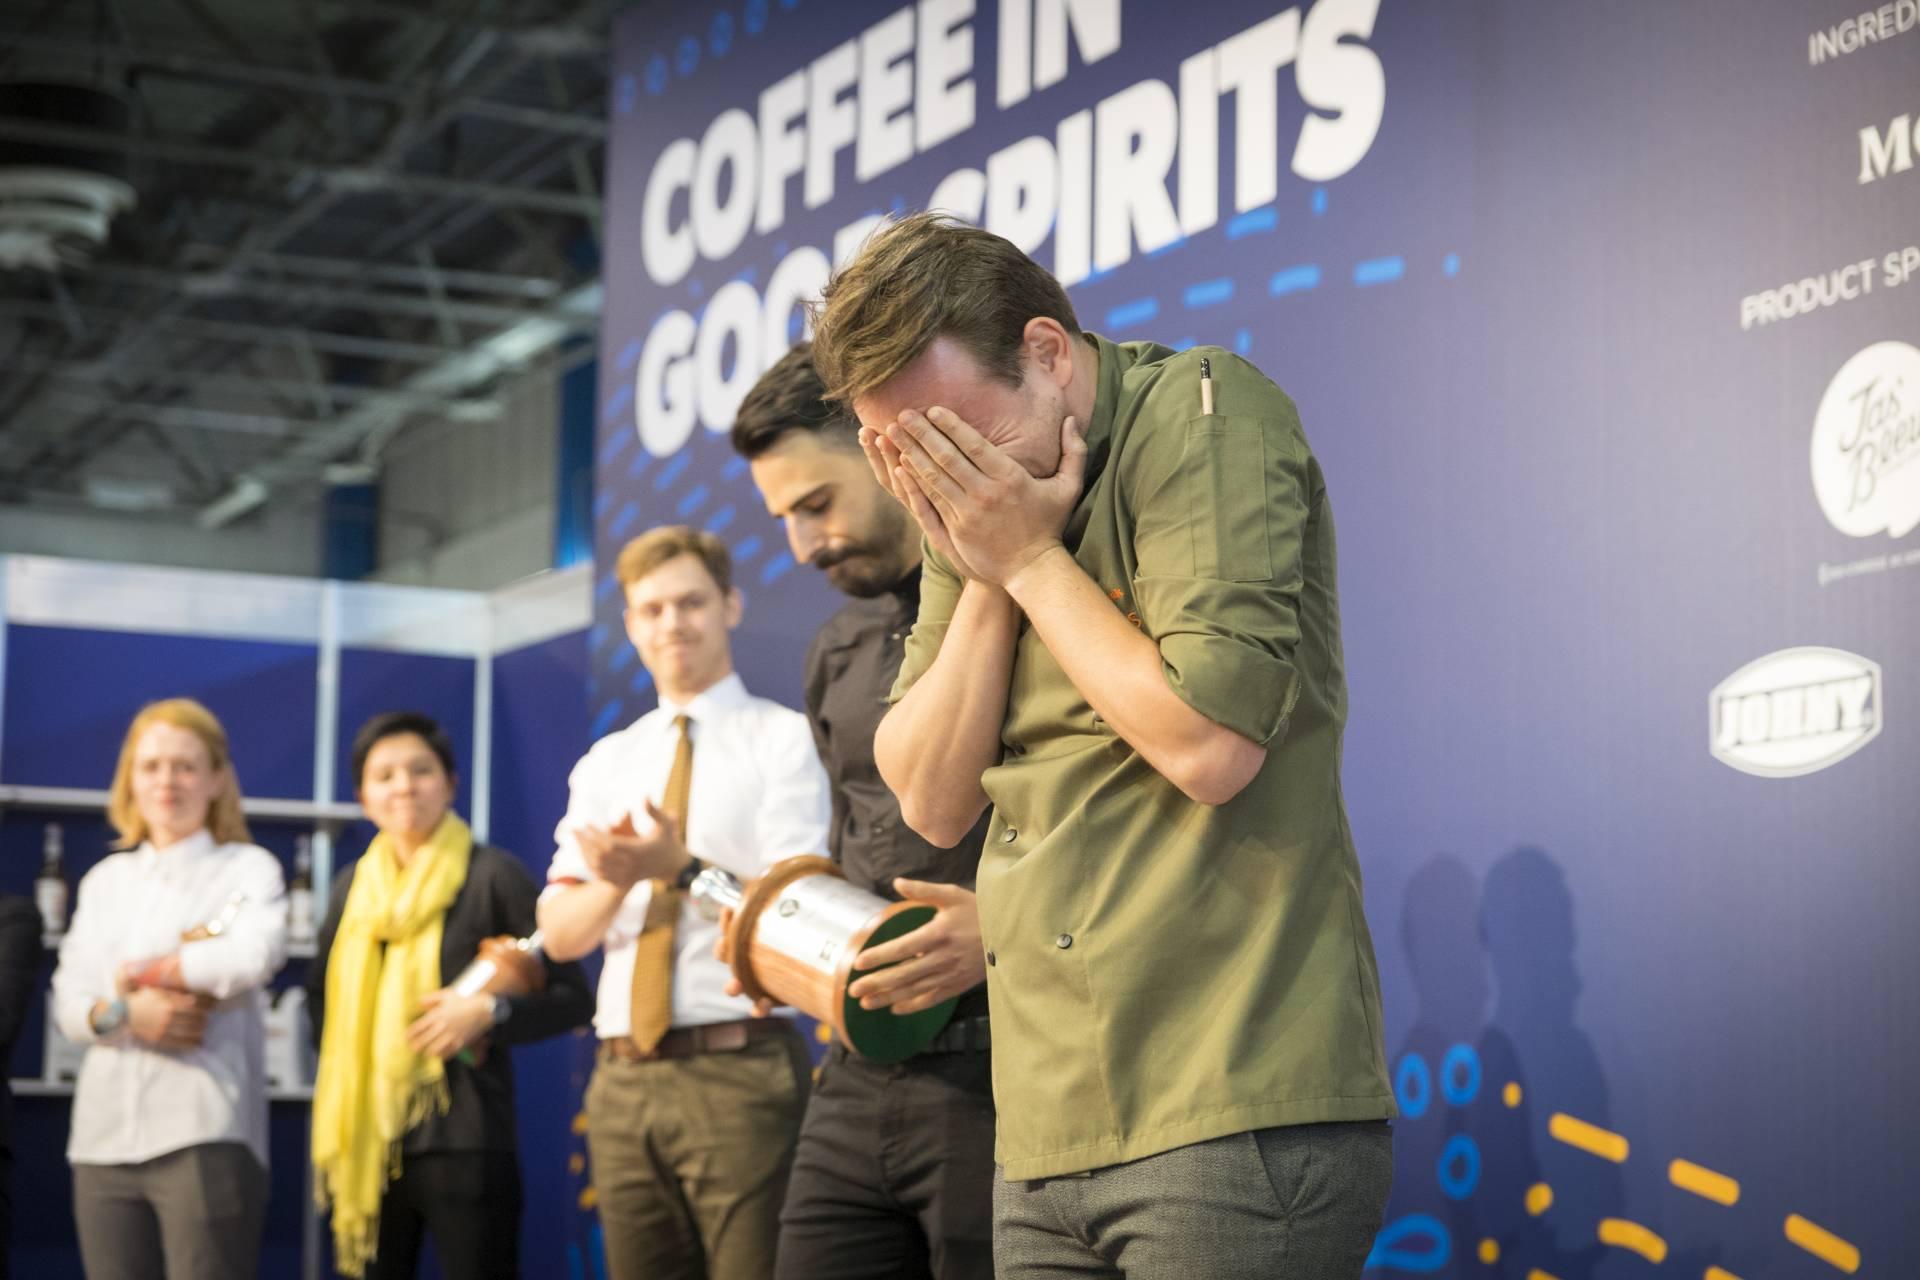 world of coffee coffee in good spirits 2017